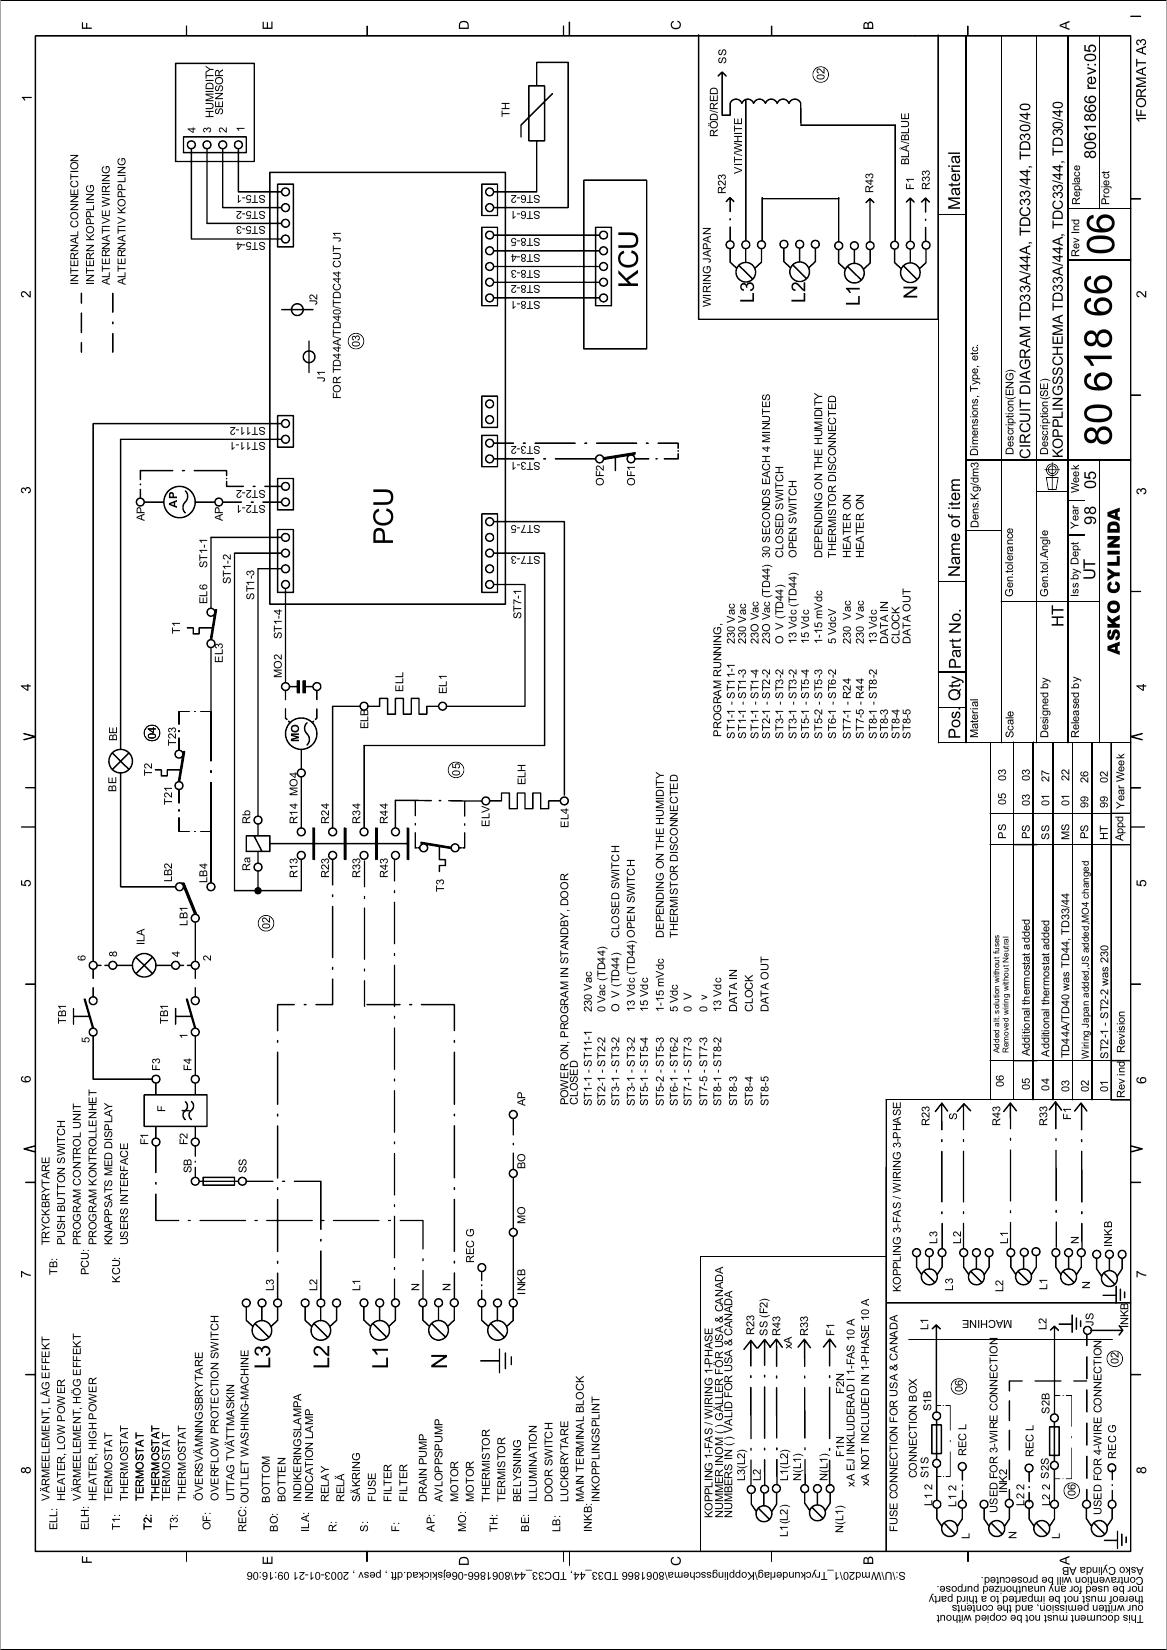 Asko Dryer Wiring Diagram Free Download Roper 8061866 06ejskickad Dft Td33a 44a Tdc33 44 Td30 40